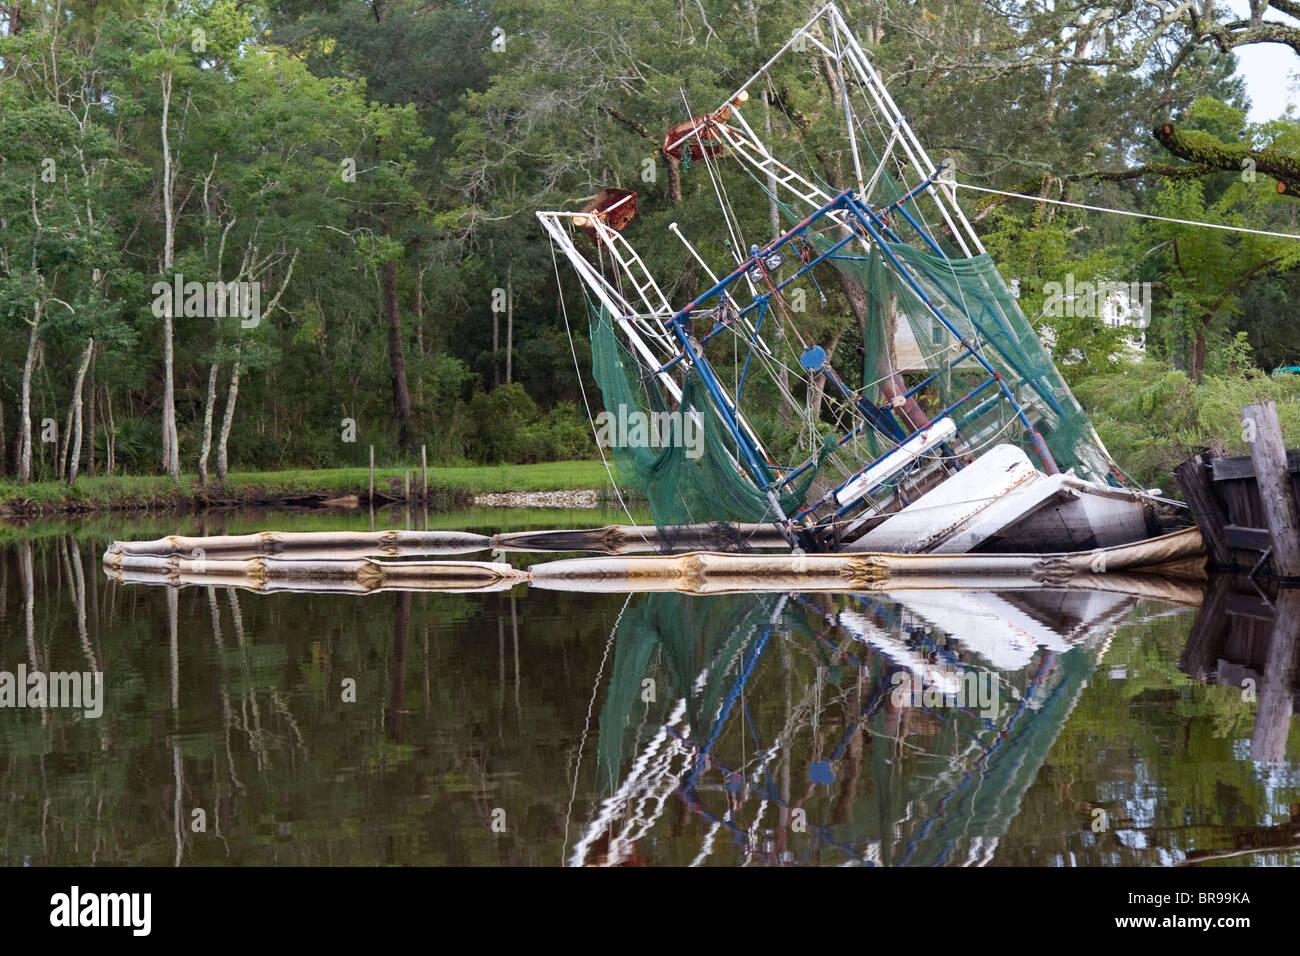 Half sunken, scuttled shrimp fishing boat in the bayou of Bayou La Batre - Stock Image